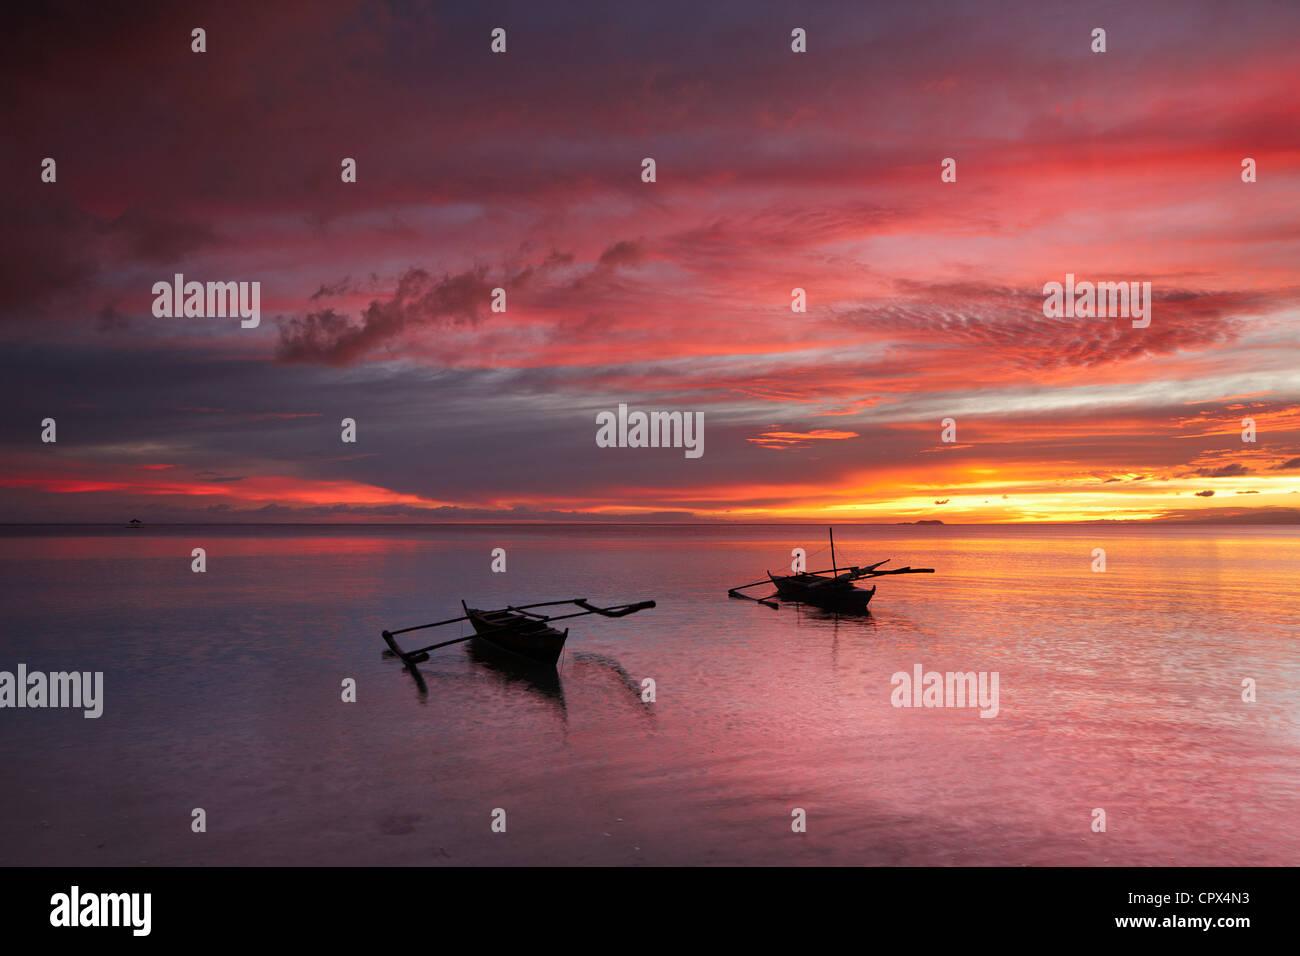 two boats off San Juan Beach at dusk, Siquijor, The Visayas, Philippines - Stock Image